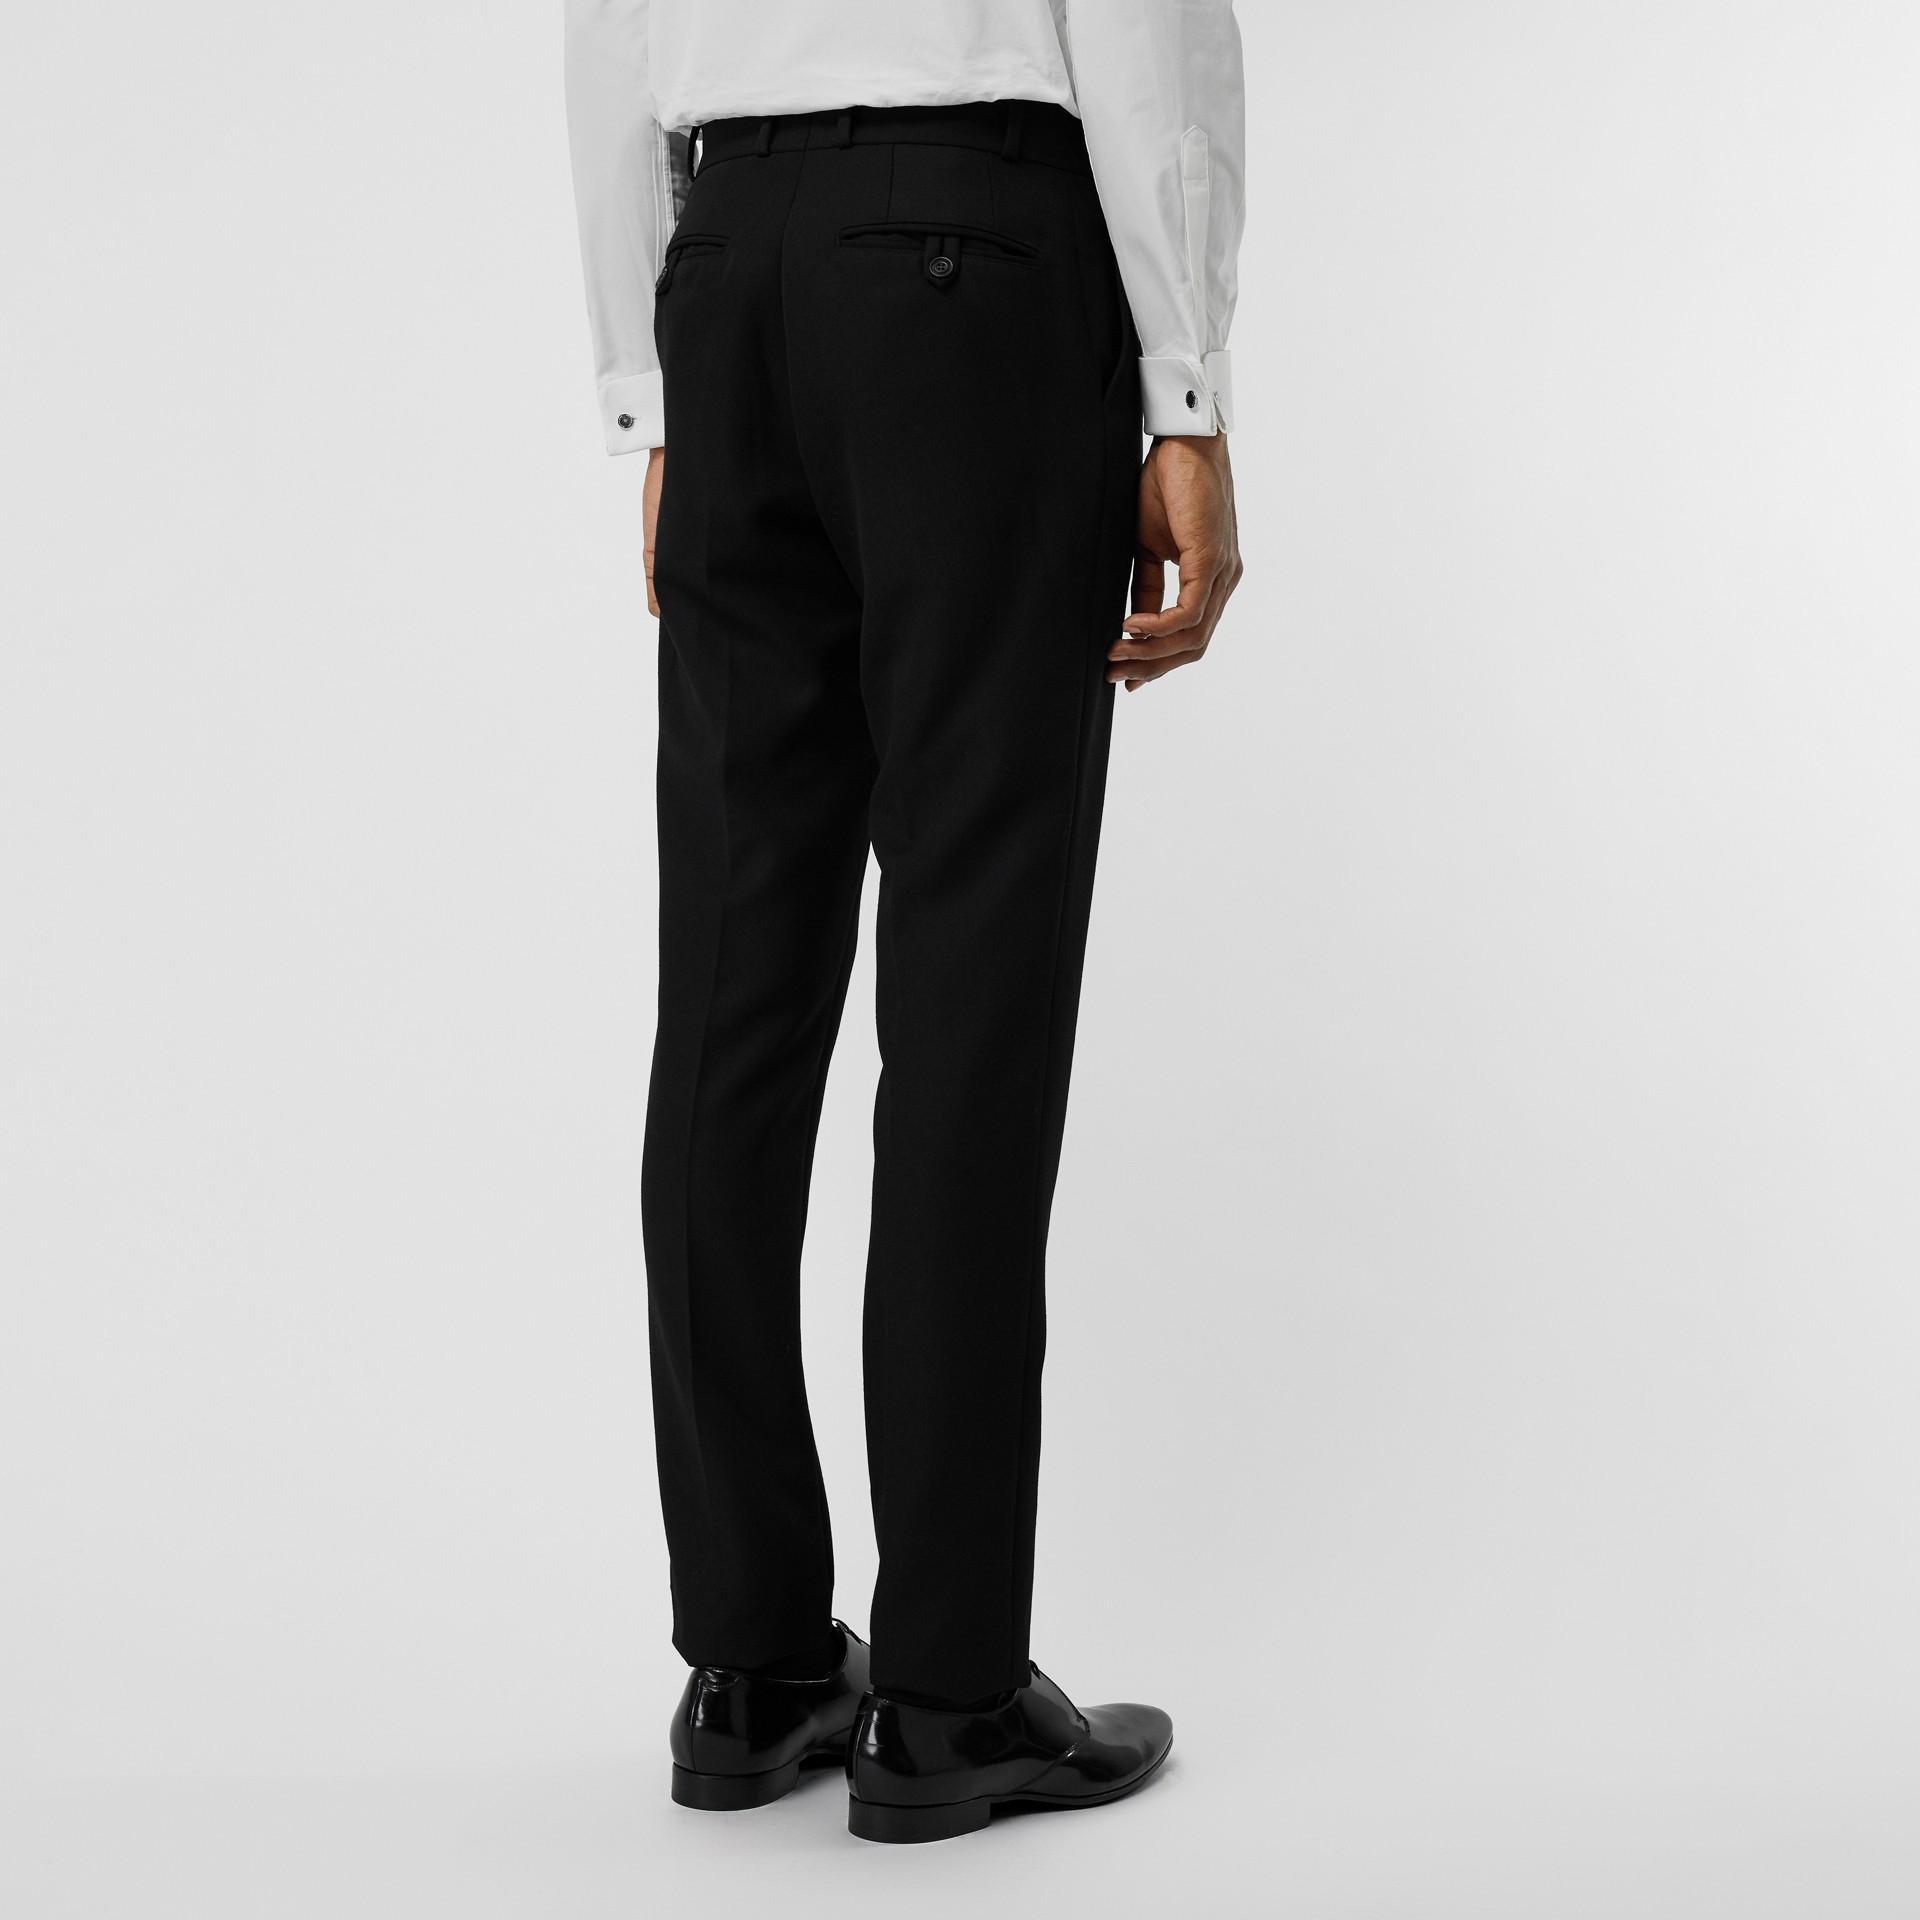 Soho Fit Bullion Stripe Wool Twill Tailored Trousers in Black - Men | Burberry - gallery image 2